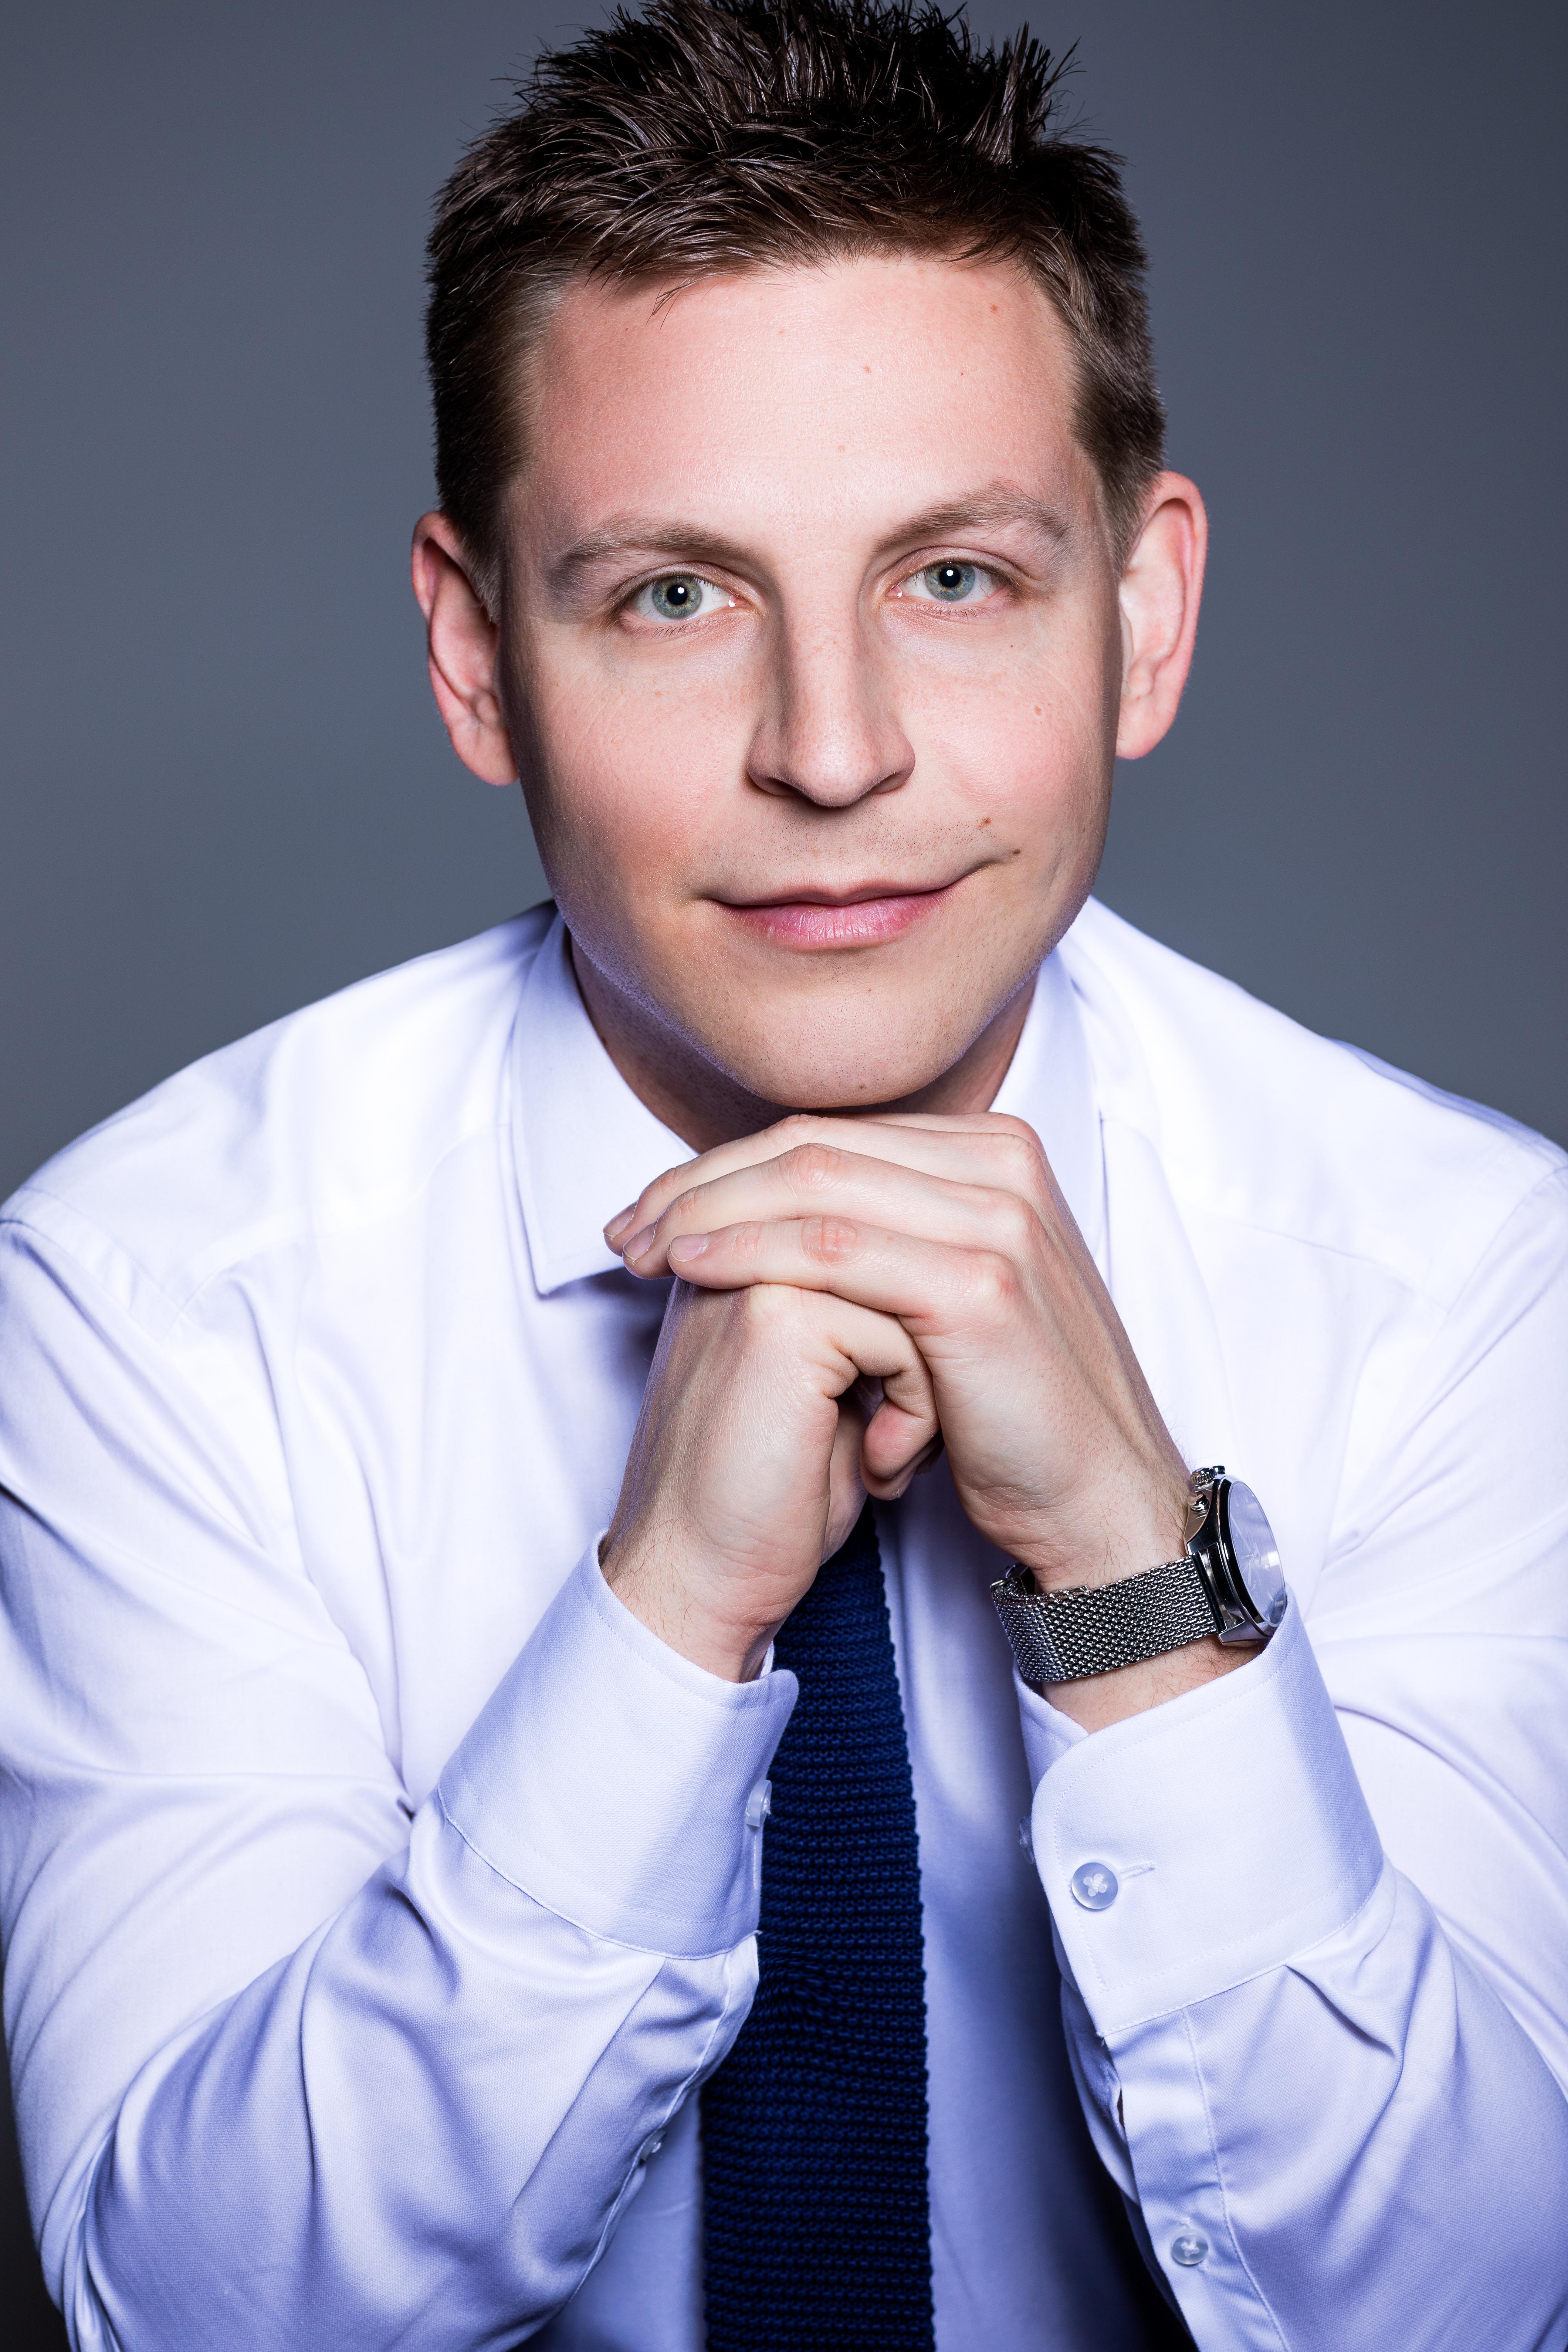 Mario Rubenzer